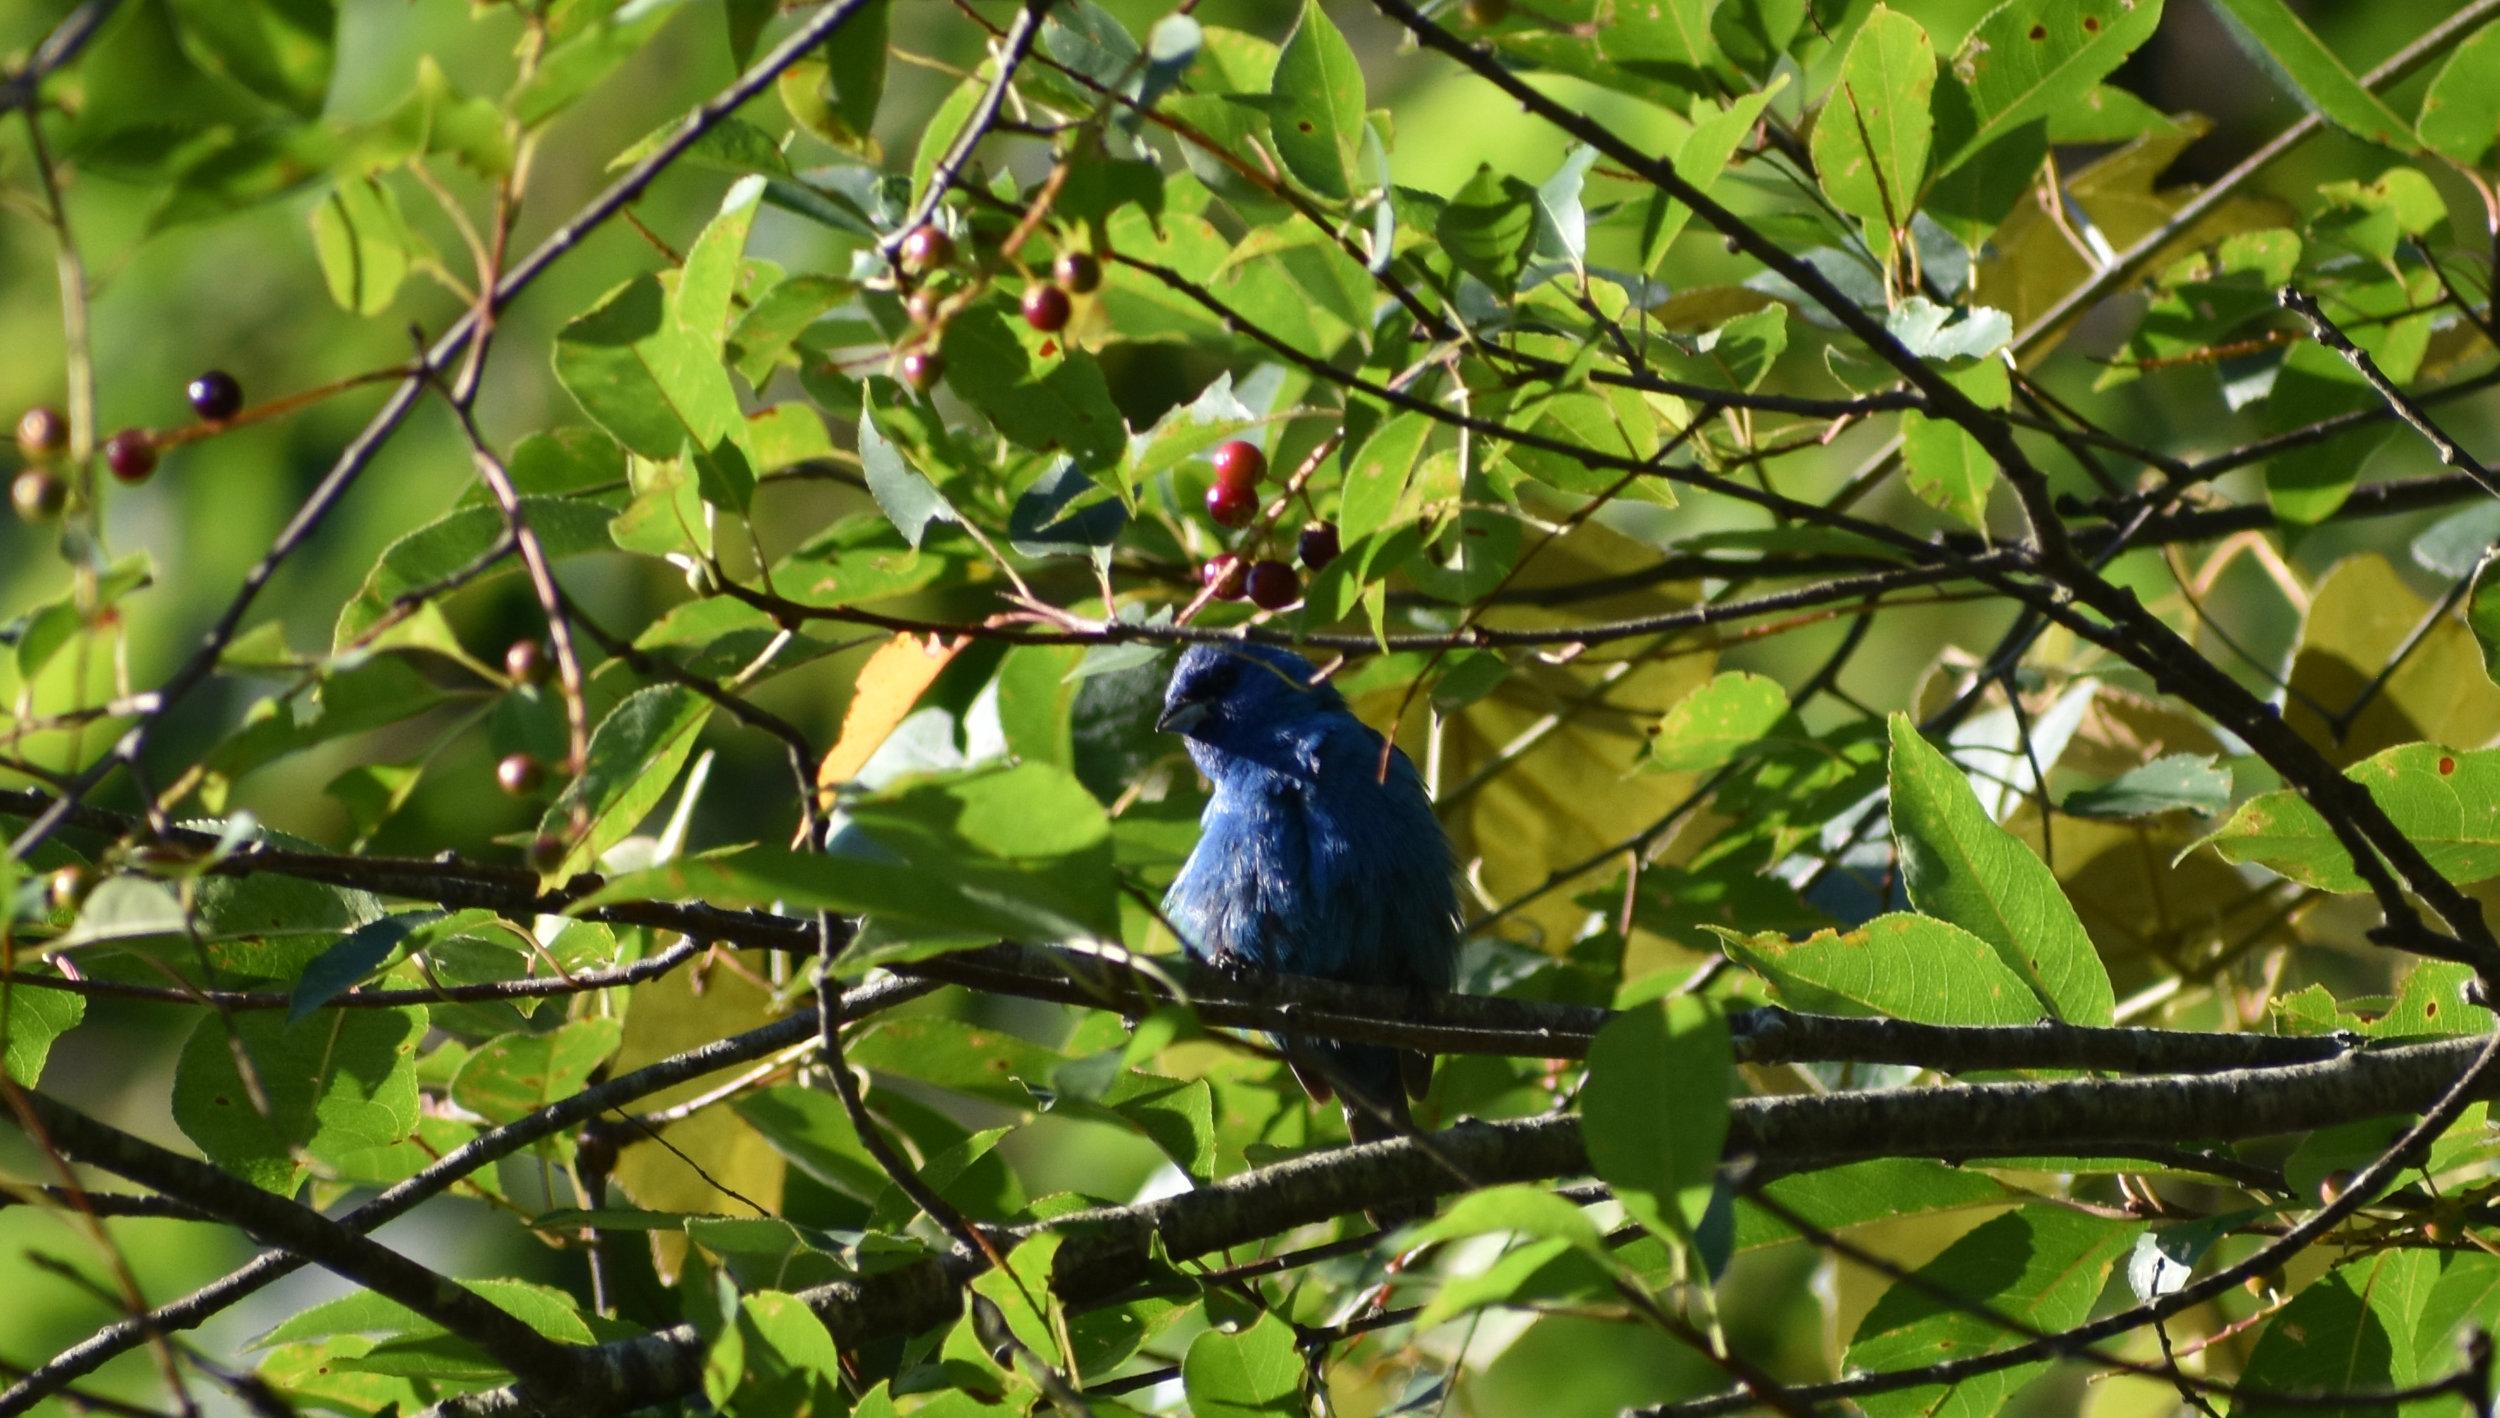 Indigo Bunting in Wild Black Cherry